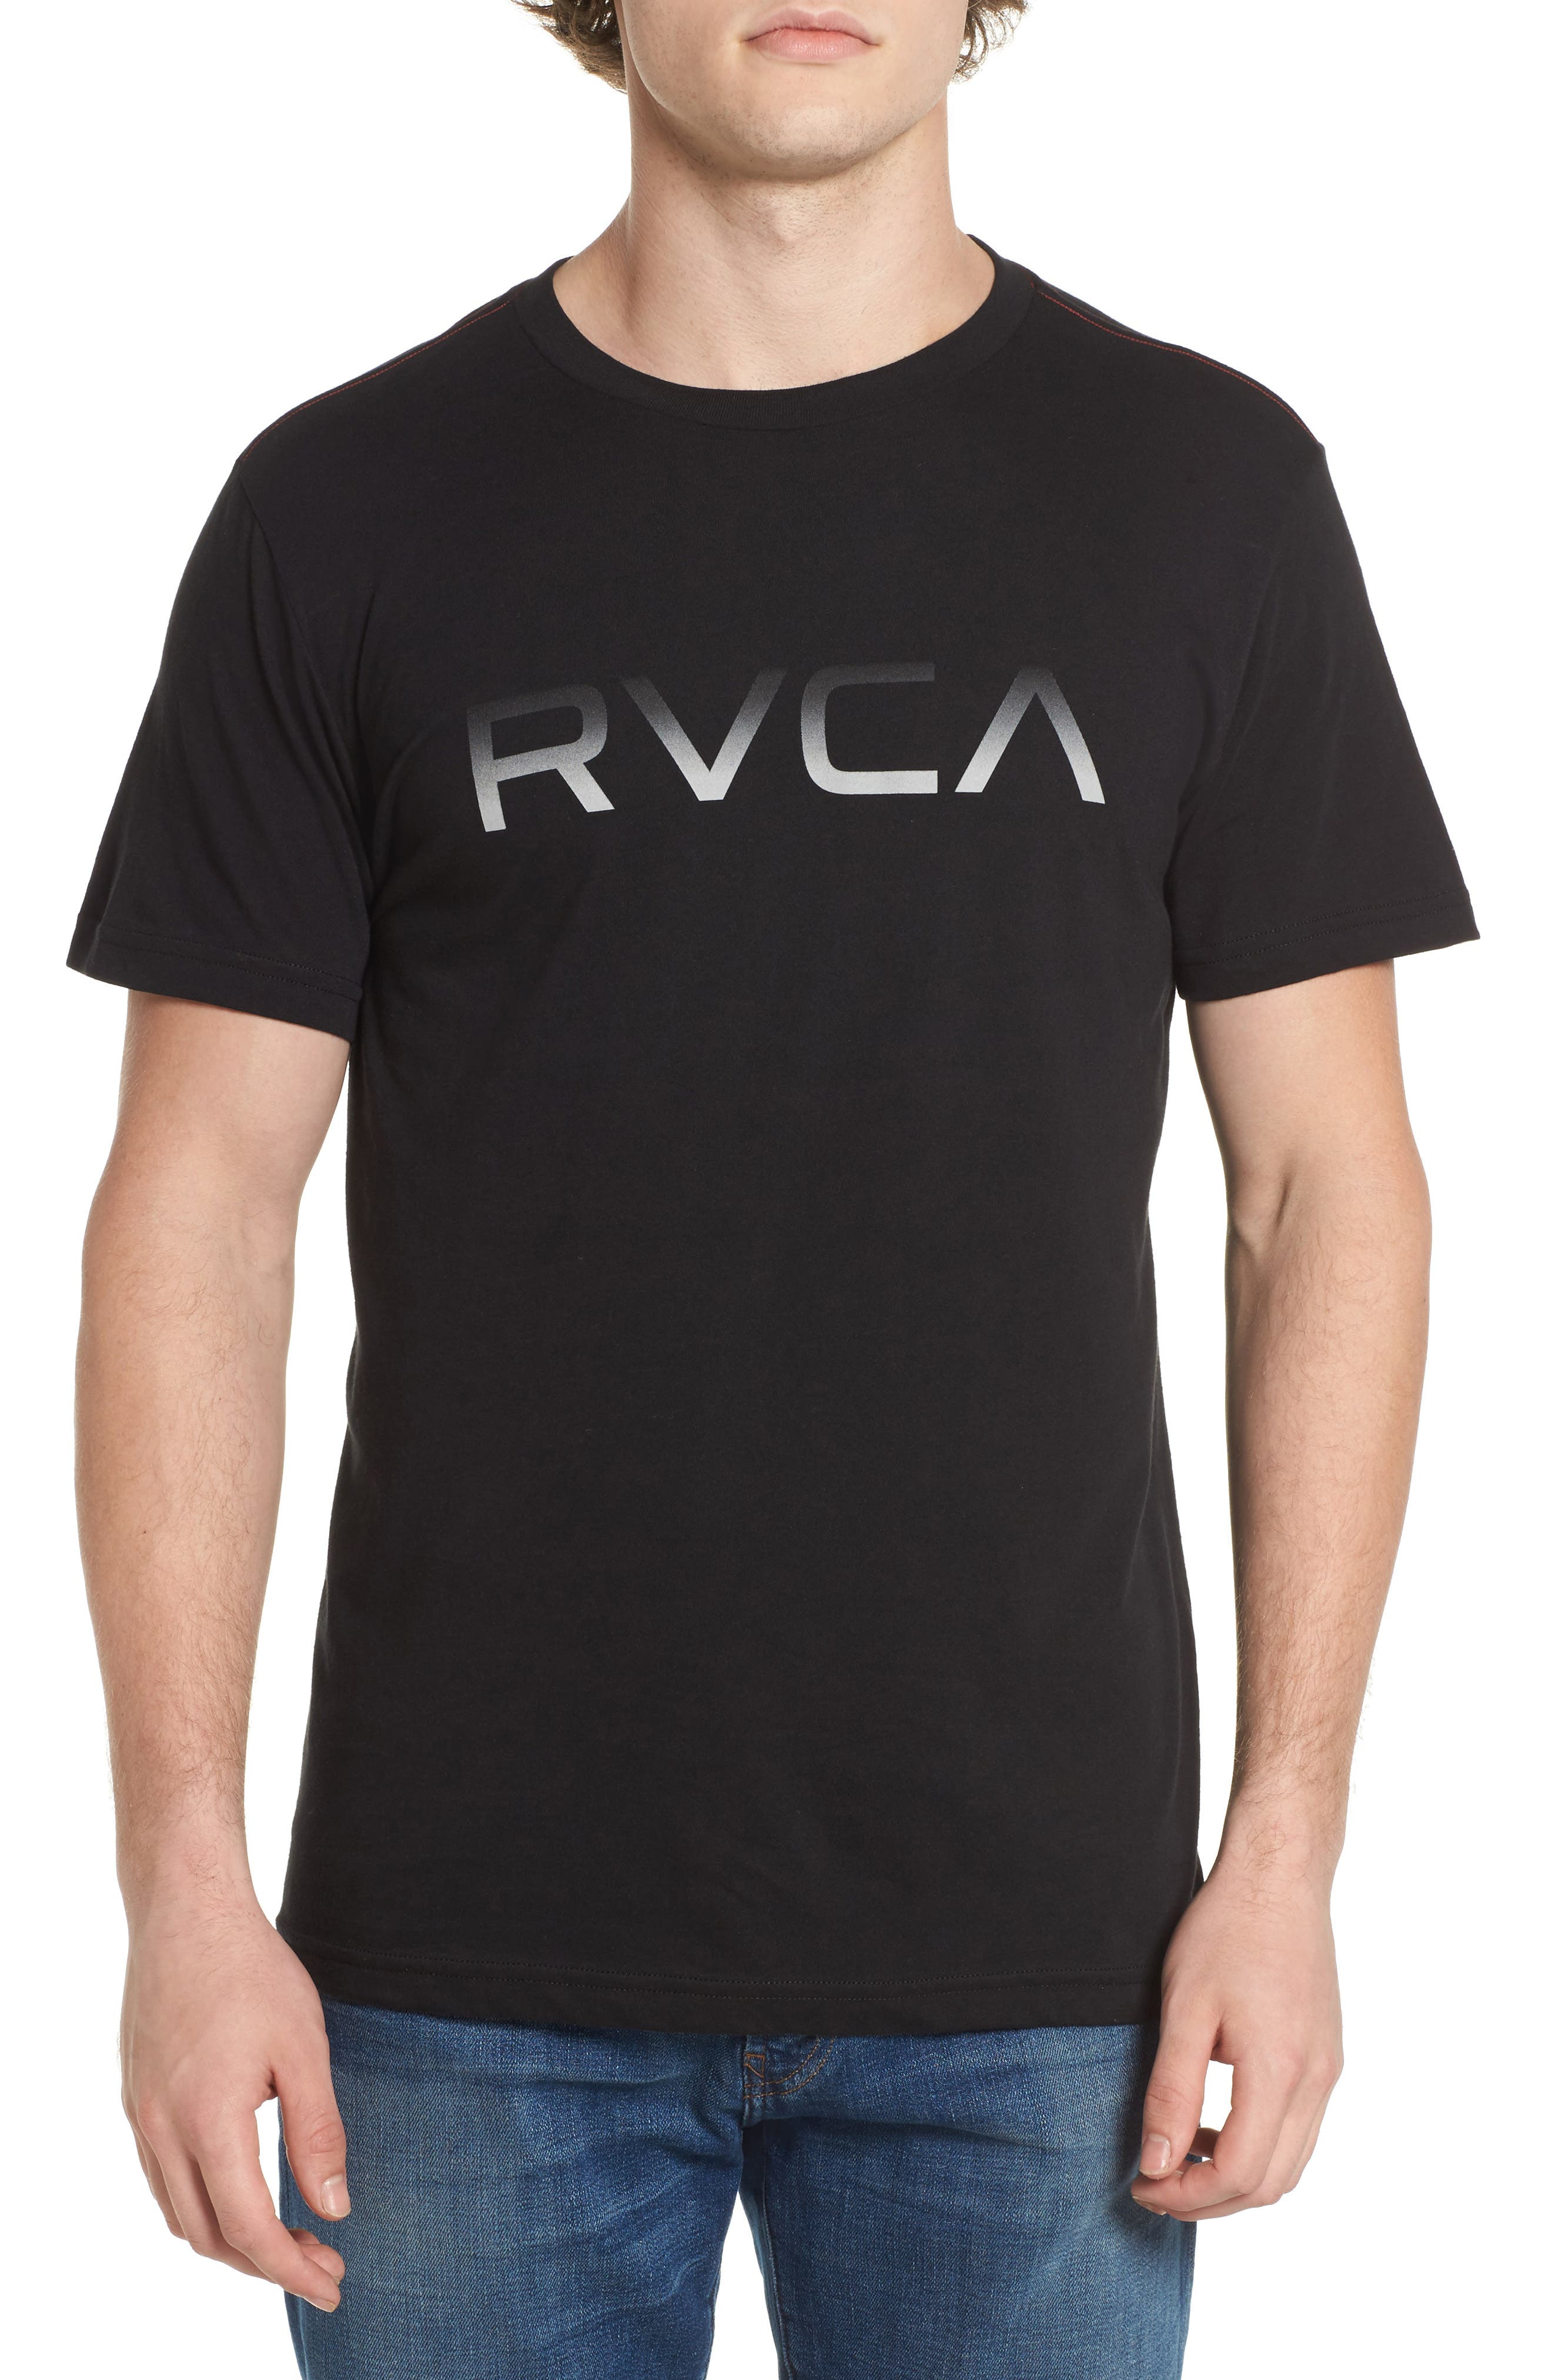 Alternate Image 1 Selected - RVCA Big RVCA Gradient Logo T-Shirt